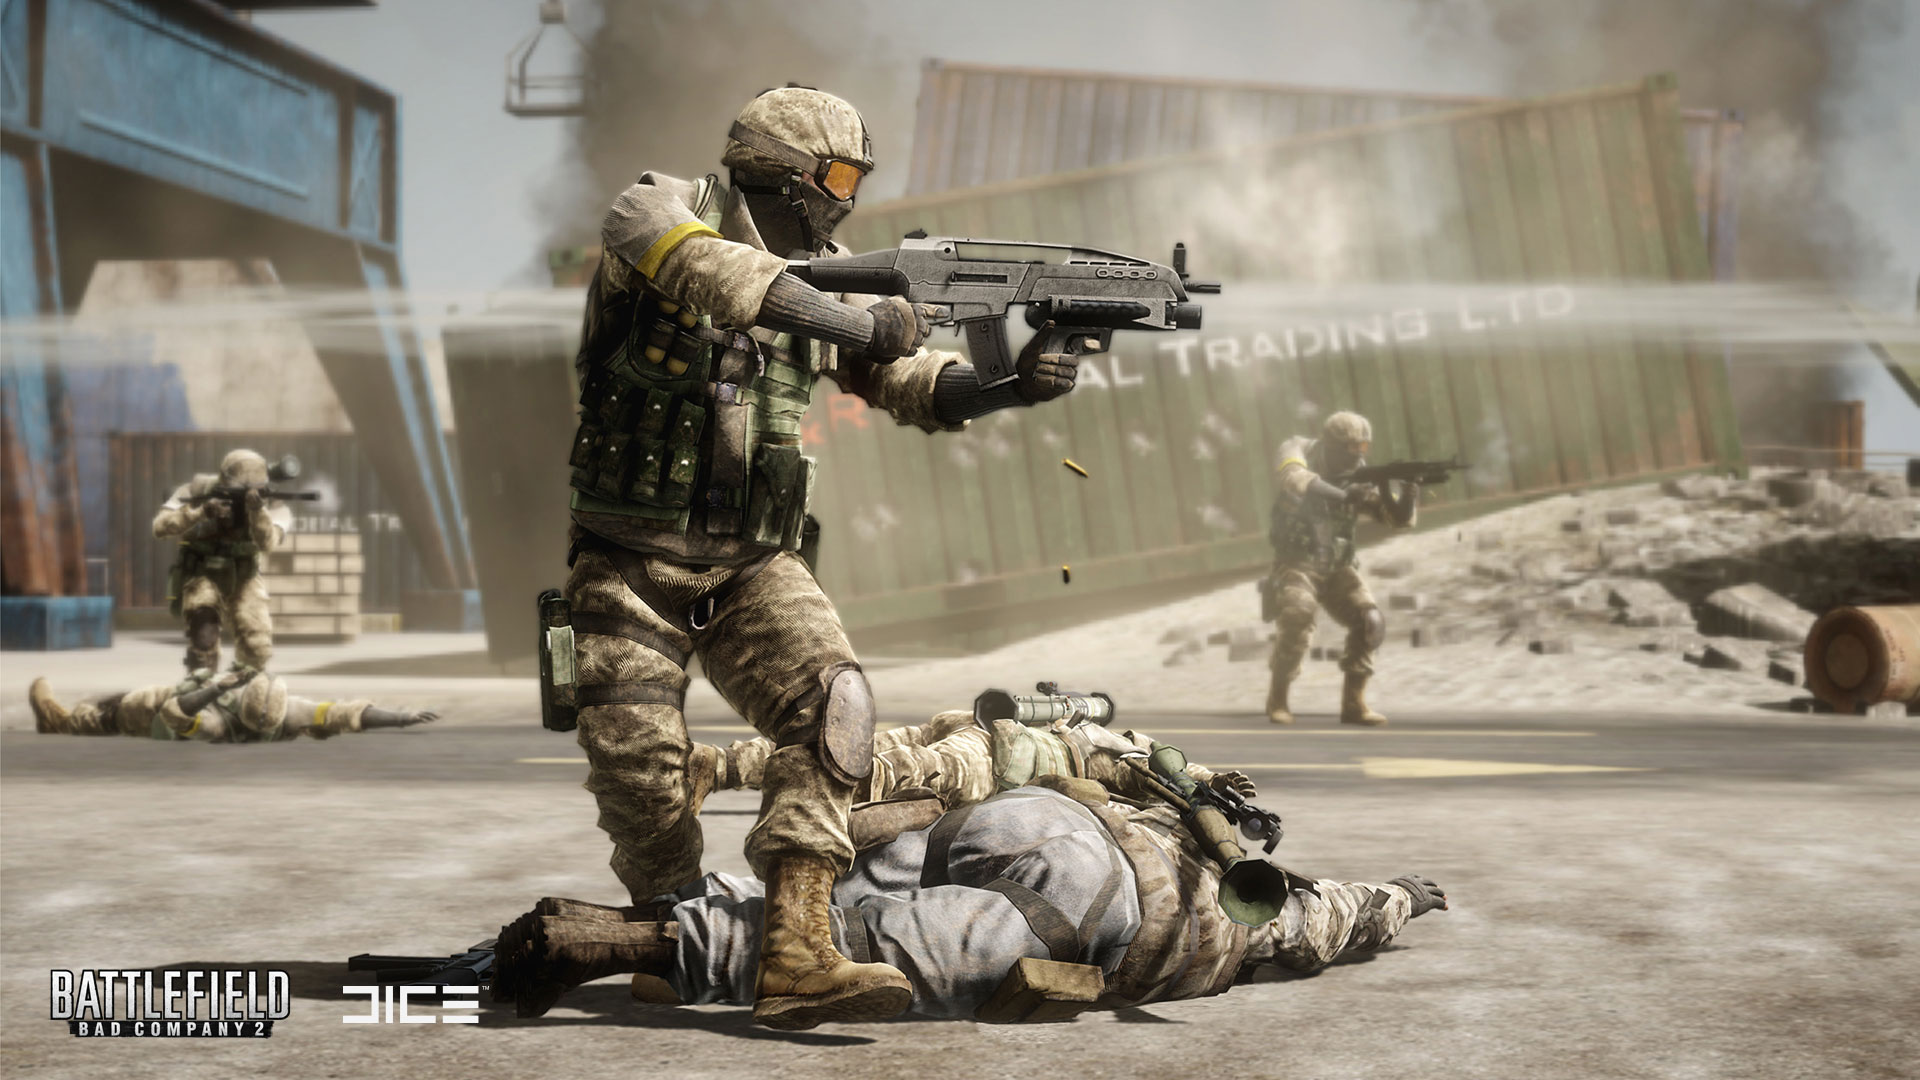 Battlefield: Bad Company 2 (2010)